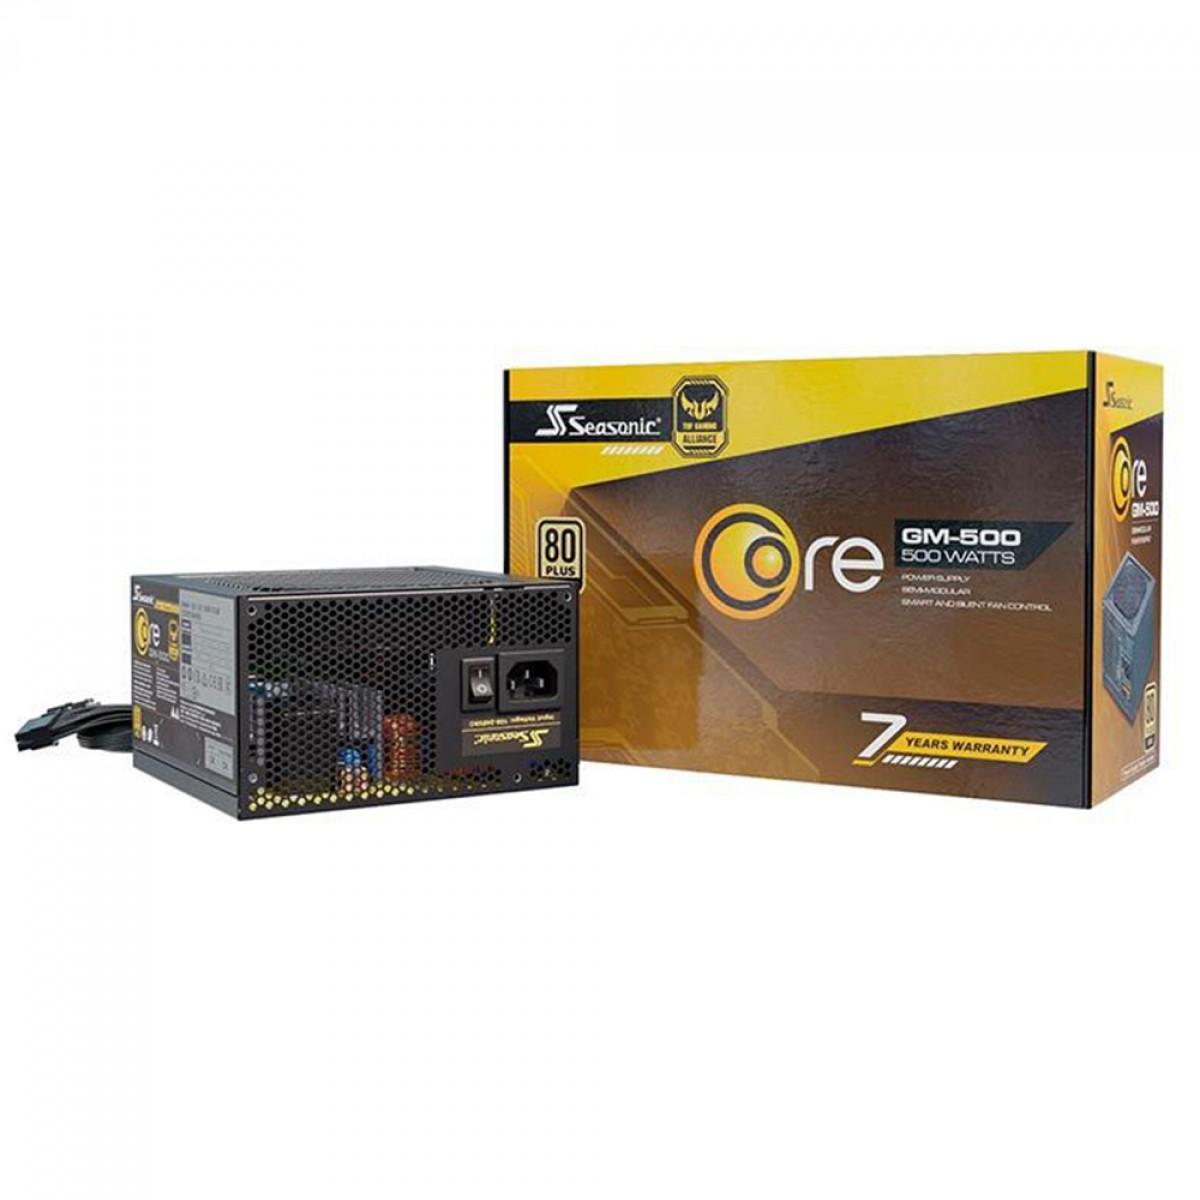 Fonte Seasonic Core GM-500, 500W, 80 Plus Gold, Semi Modular